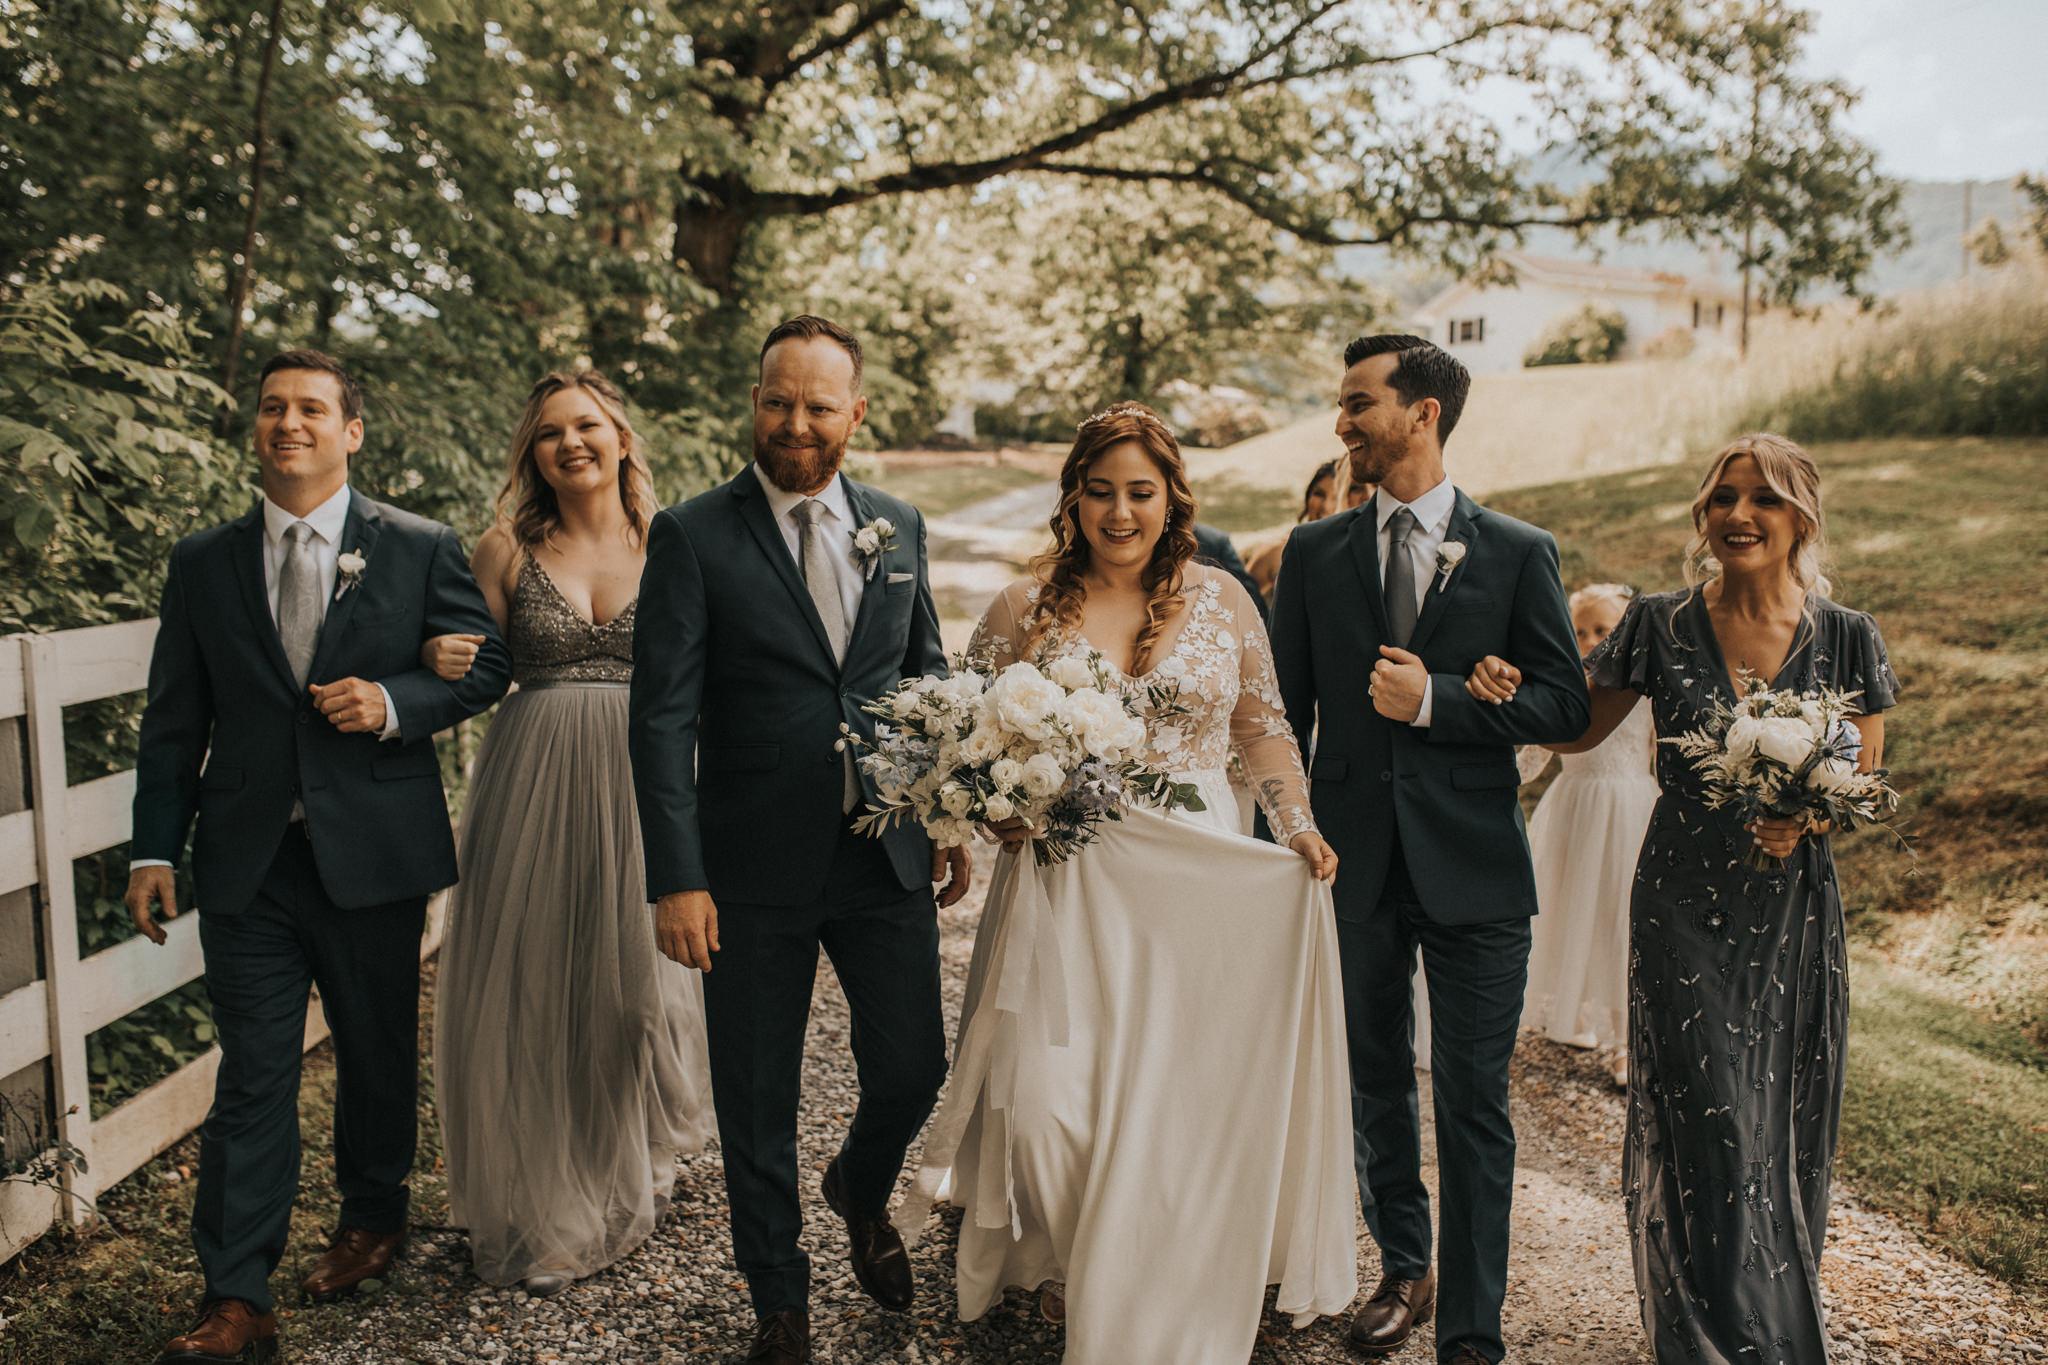 KateMatt-North-Georgia-Wedding-Photographer-Mountain-Laurel-Farm-54.jpg